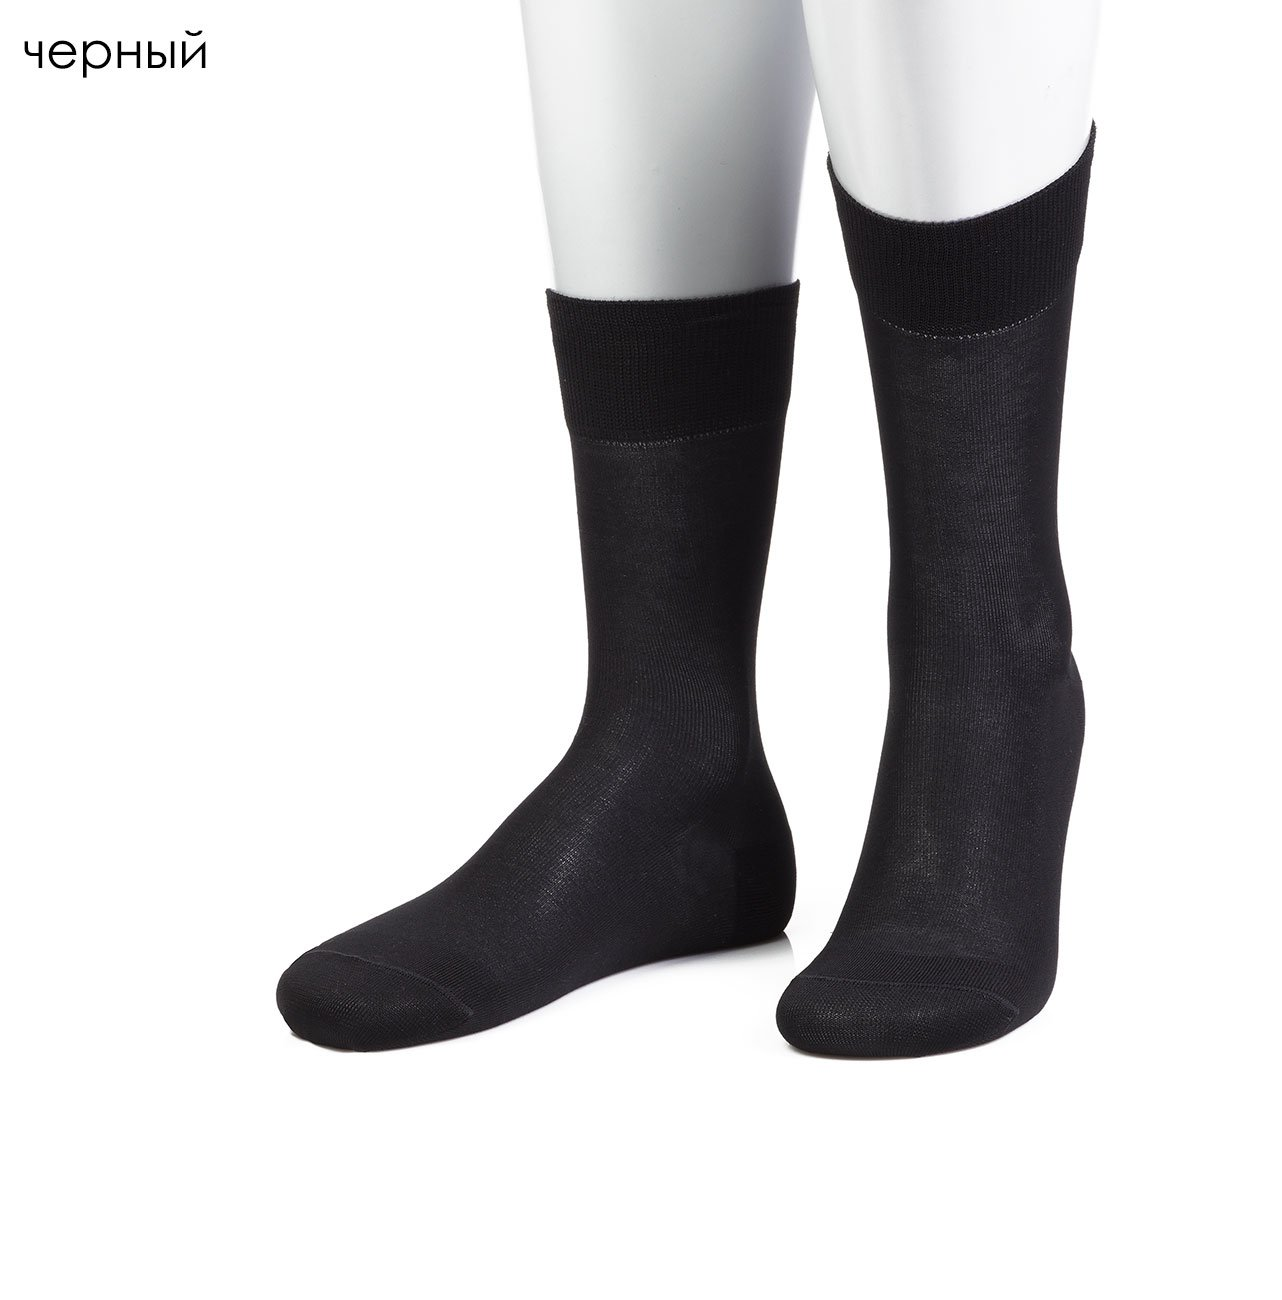 Мужские носки 15SC1 Sergio di Calze